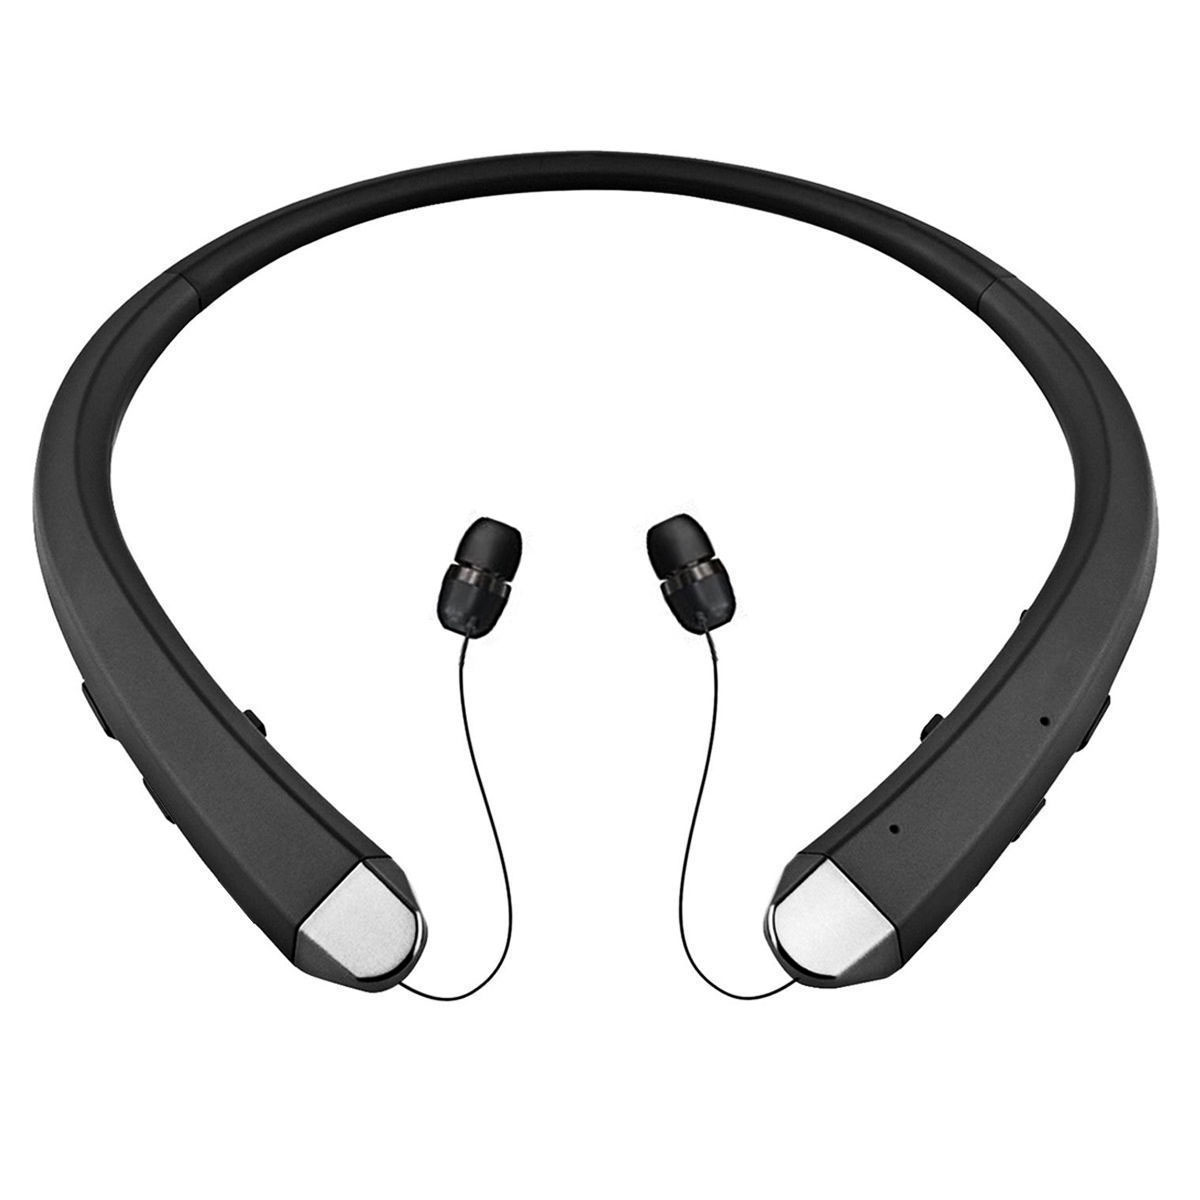 Wireless Bluetooth 4.0 Headset Sport Stereo Retractable Headphone Earbuds w/ Mic